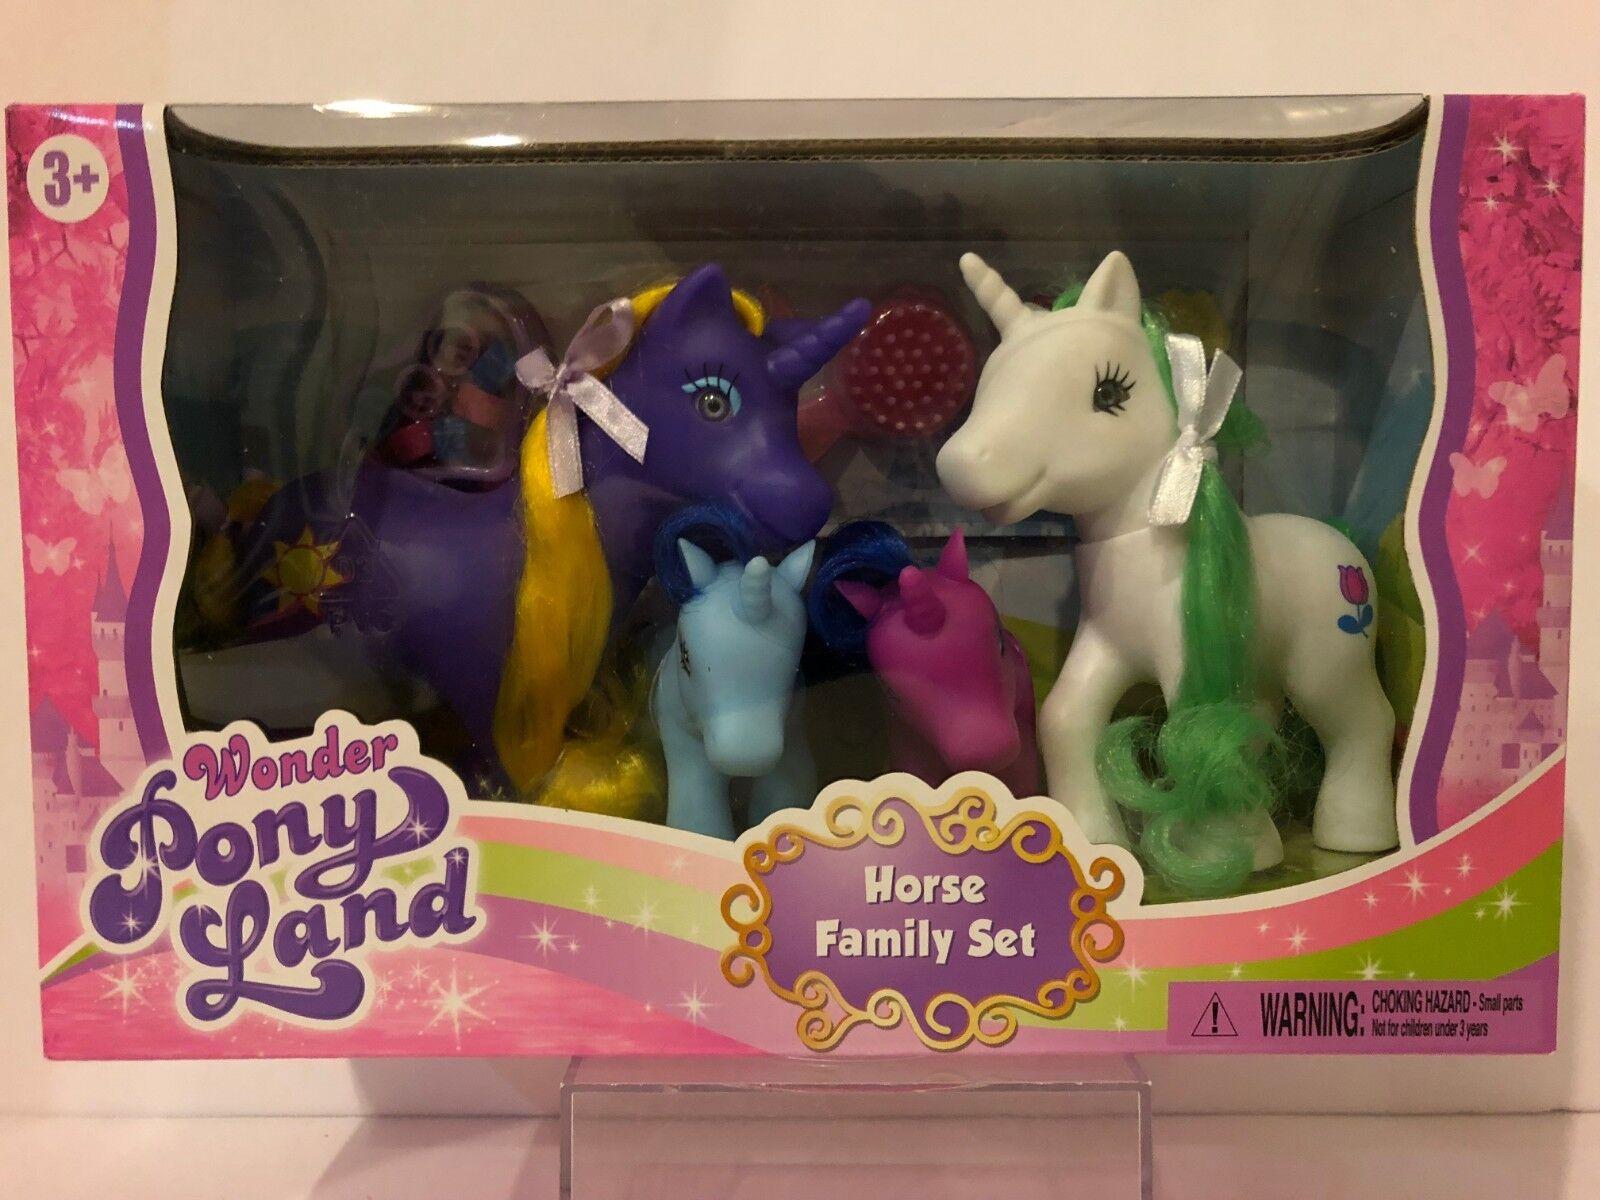 Wonder Pony Land Pretty Horse Set Toy Colour May Vary Gigo Toys For Sale Online Ebay